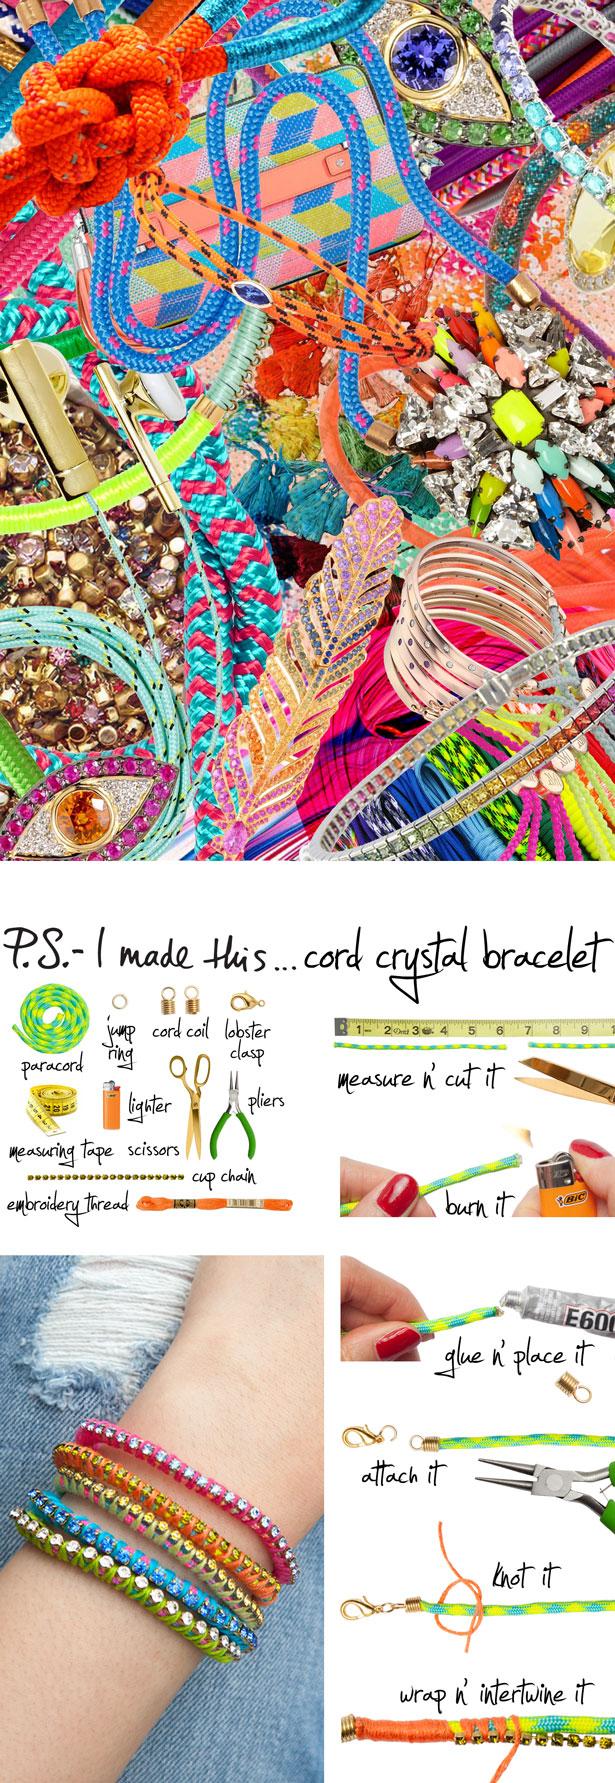 07.01.14_Wrapped-Bracelets-MERGED